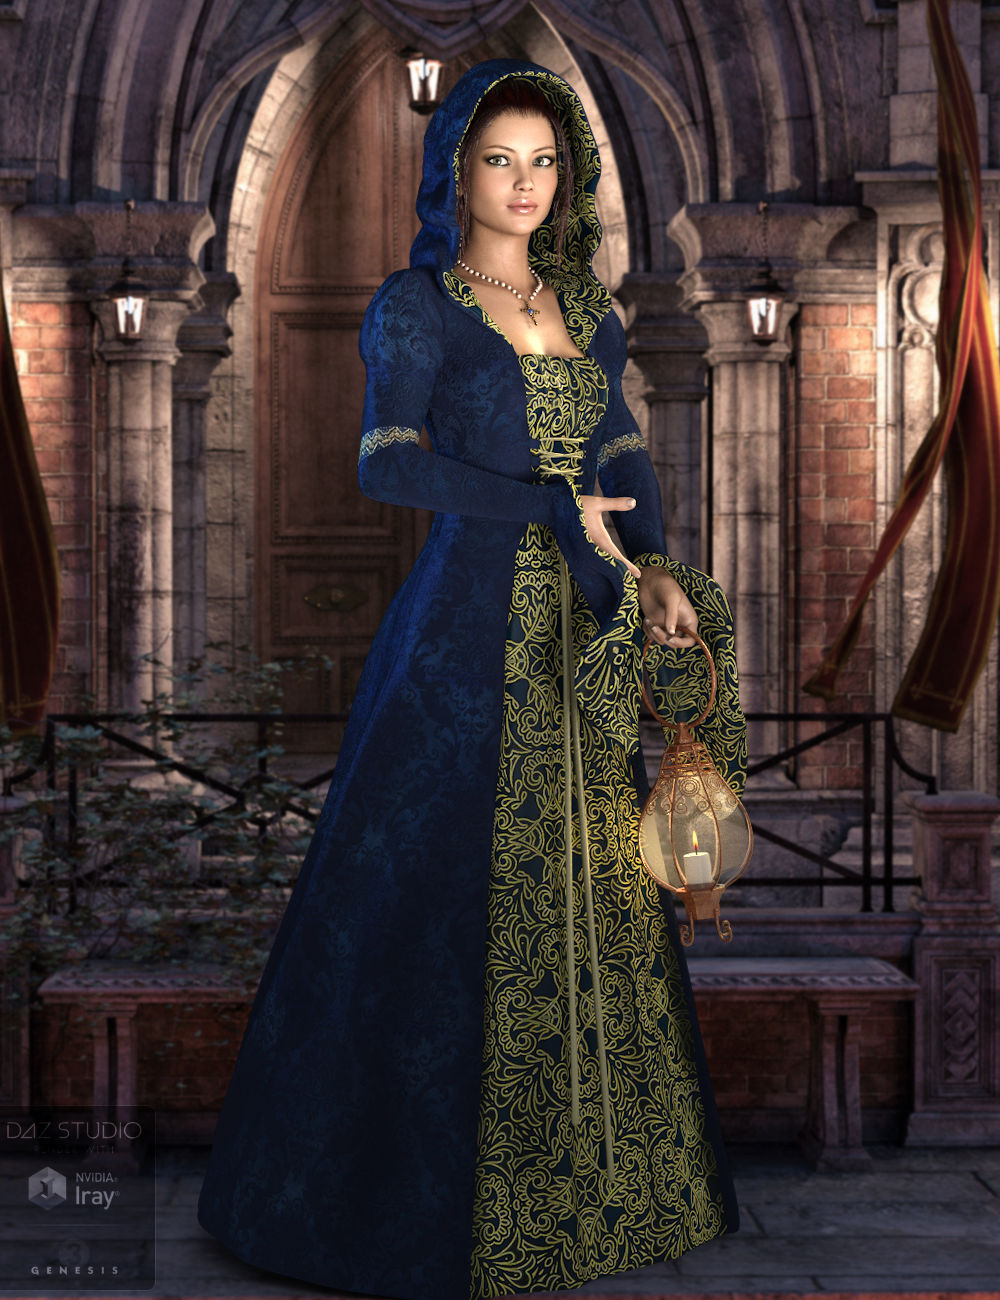 Ayleth for Genesis 3 Female(s) by: WildDesigns, 3D Models by Daz 3D